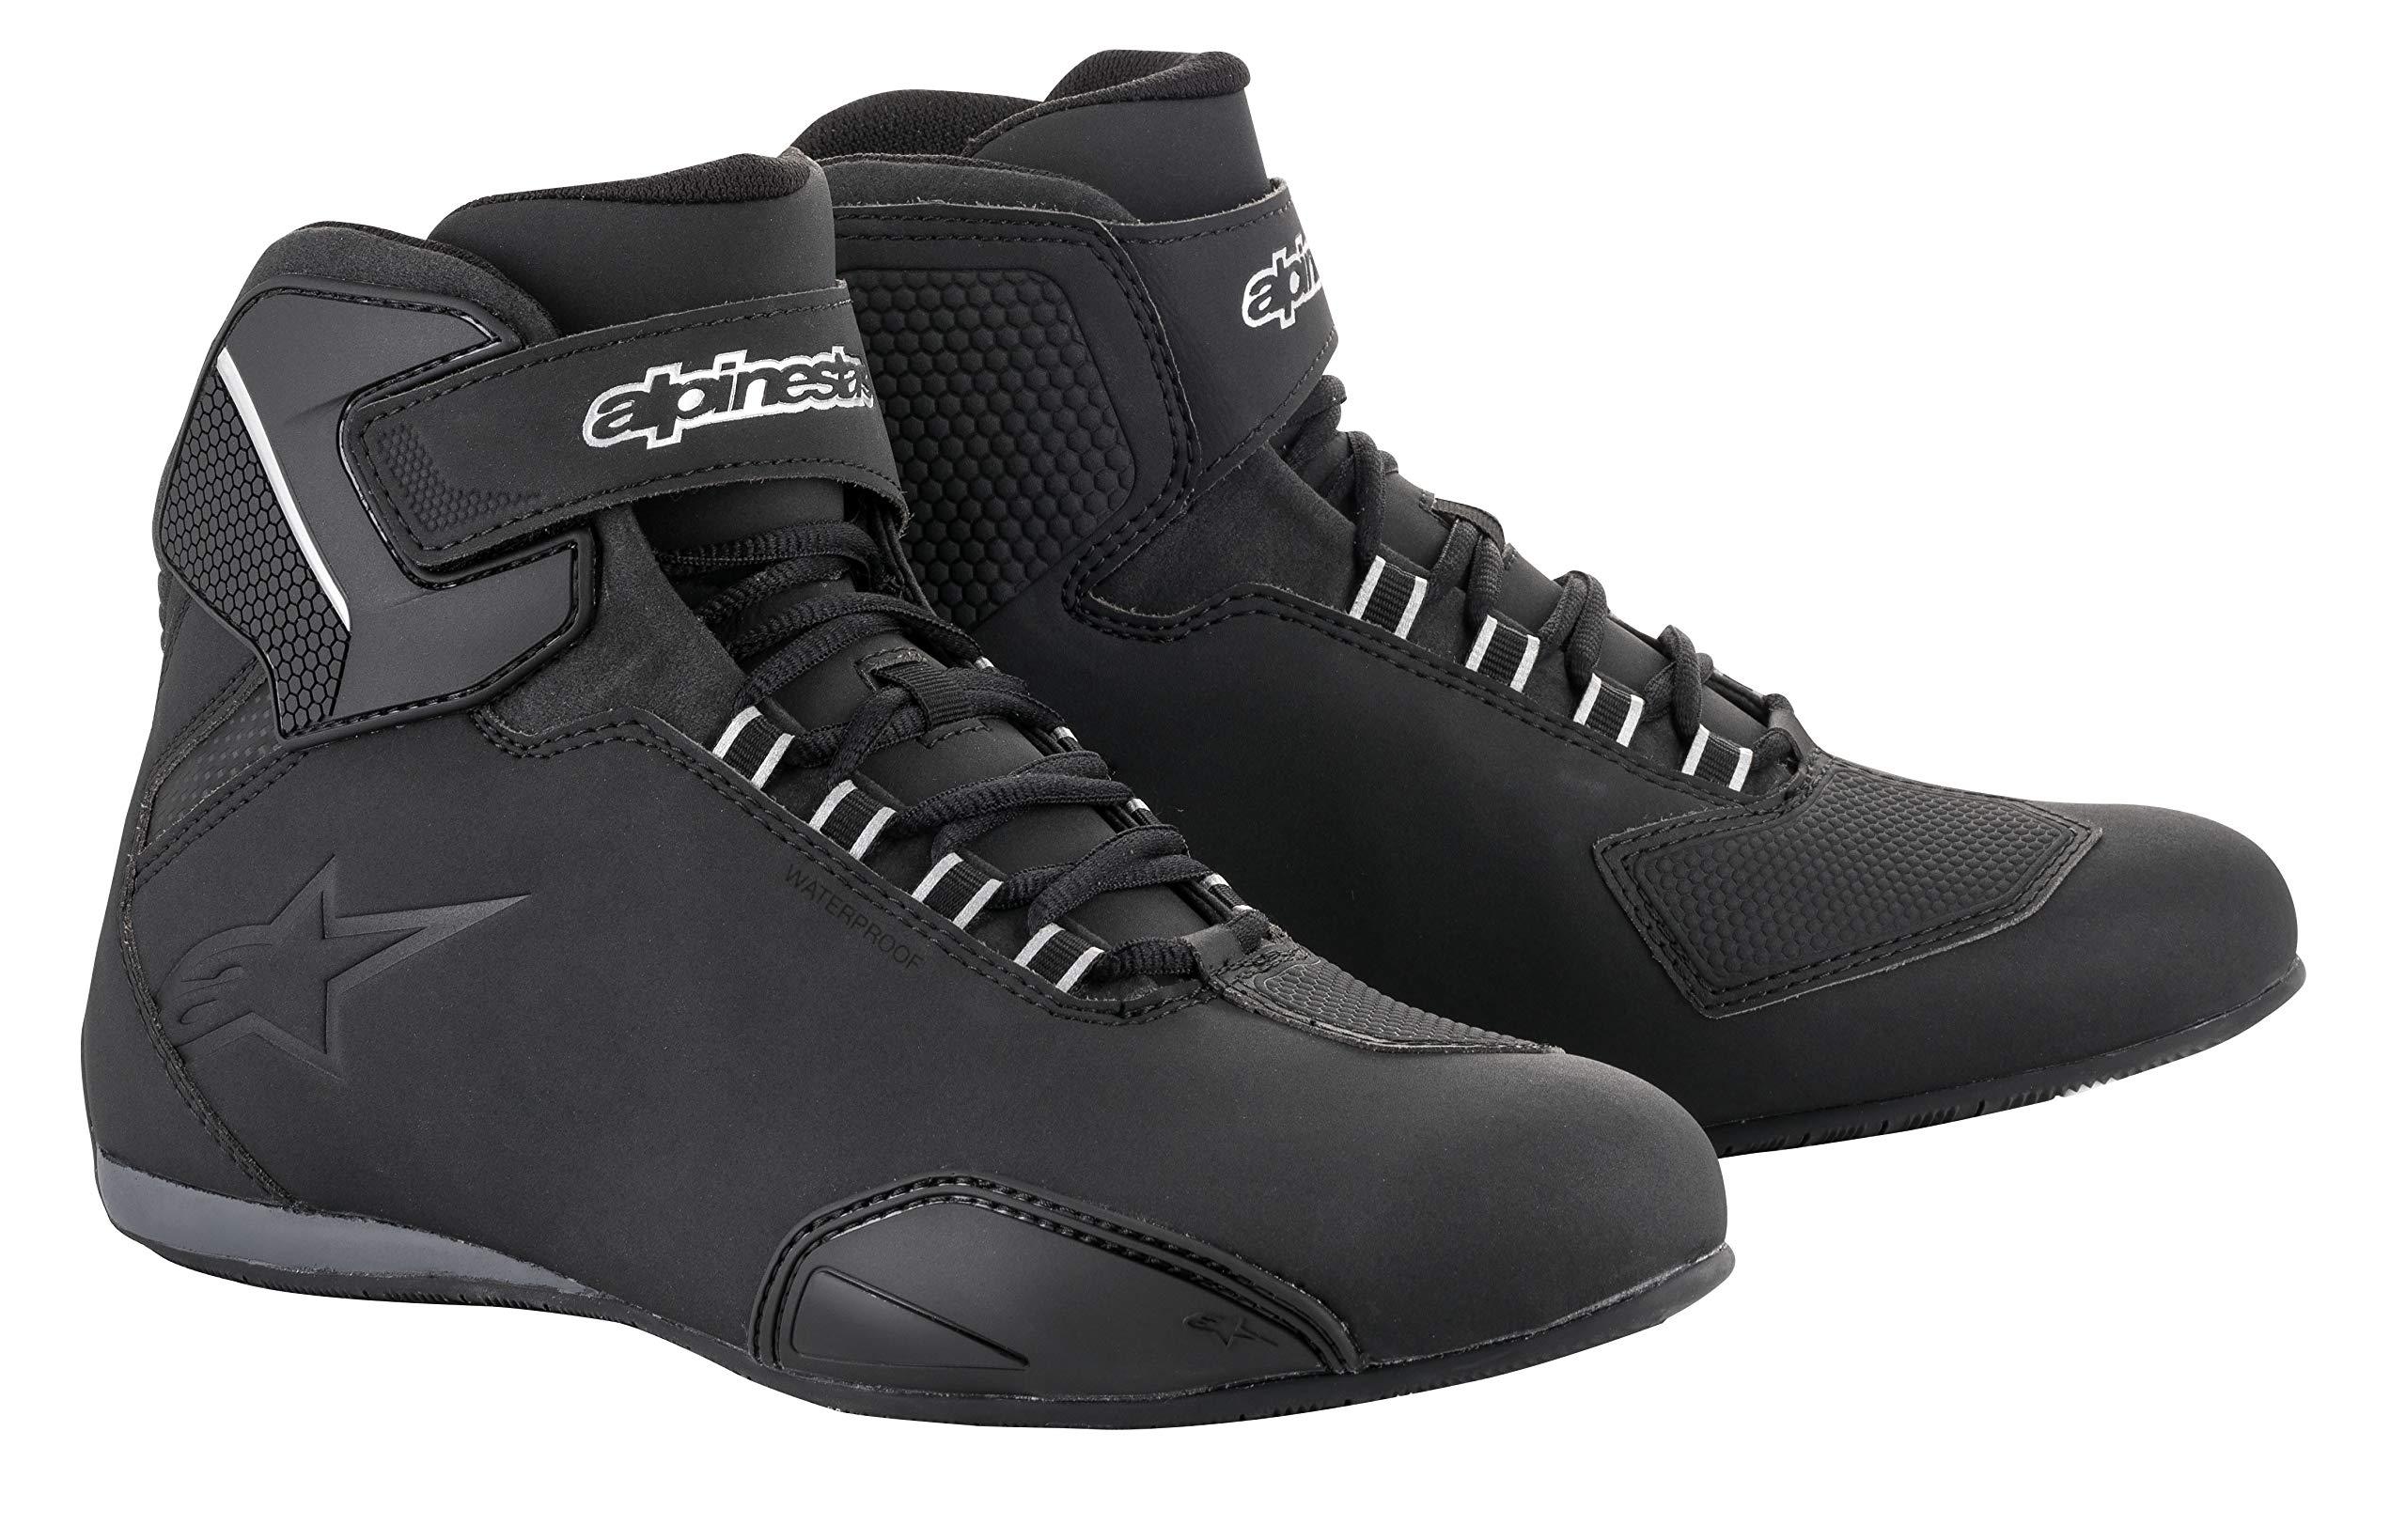 Sektor Wateproof Motorcycle Riding Shoe (11.5, Black)